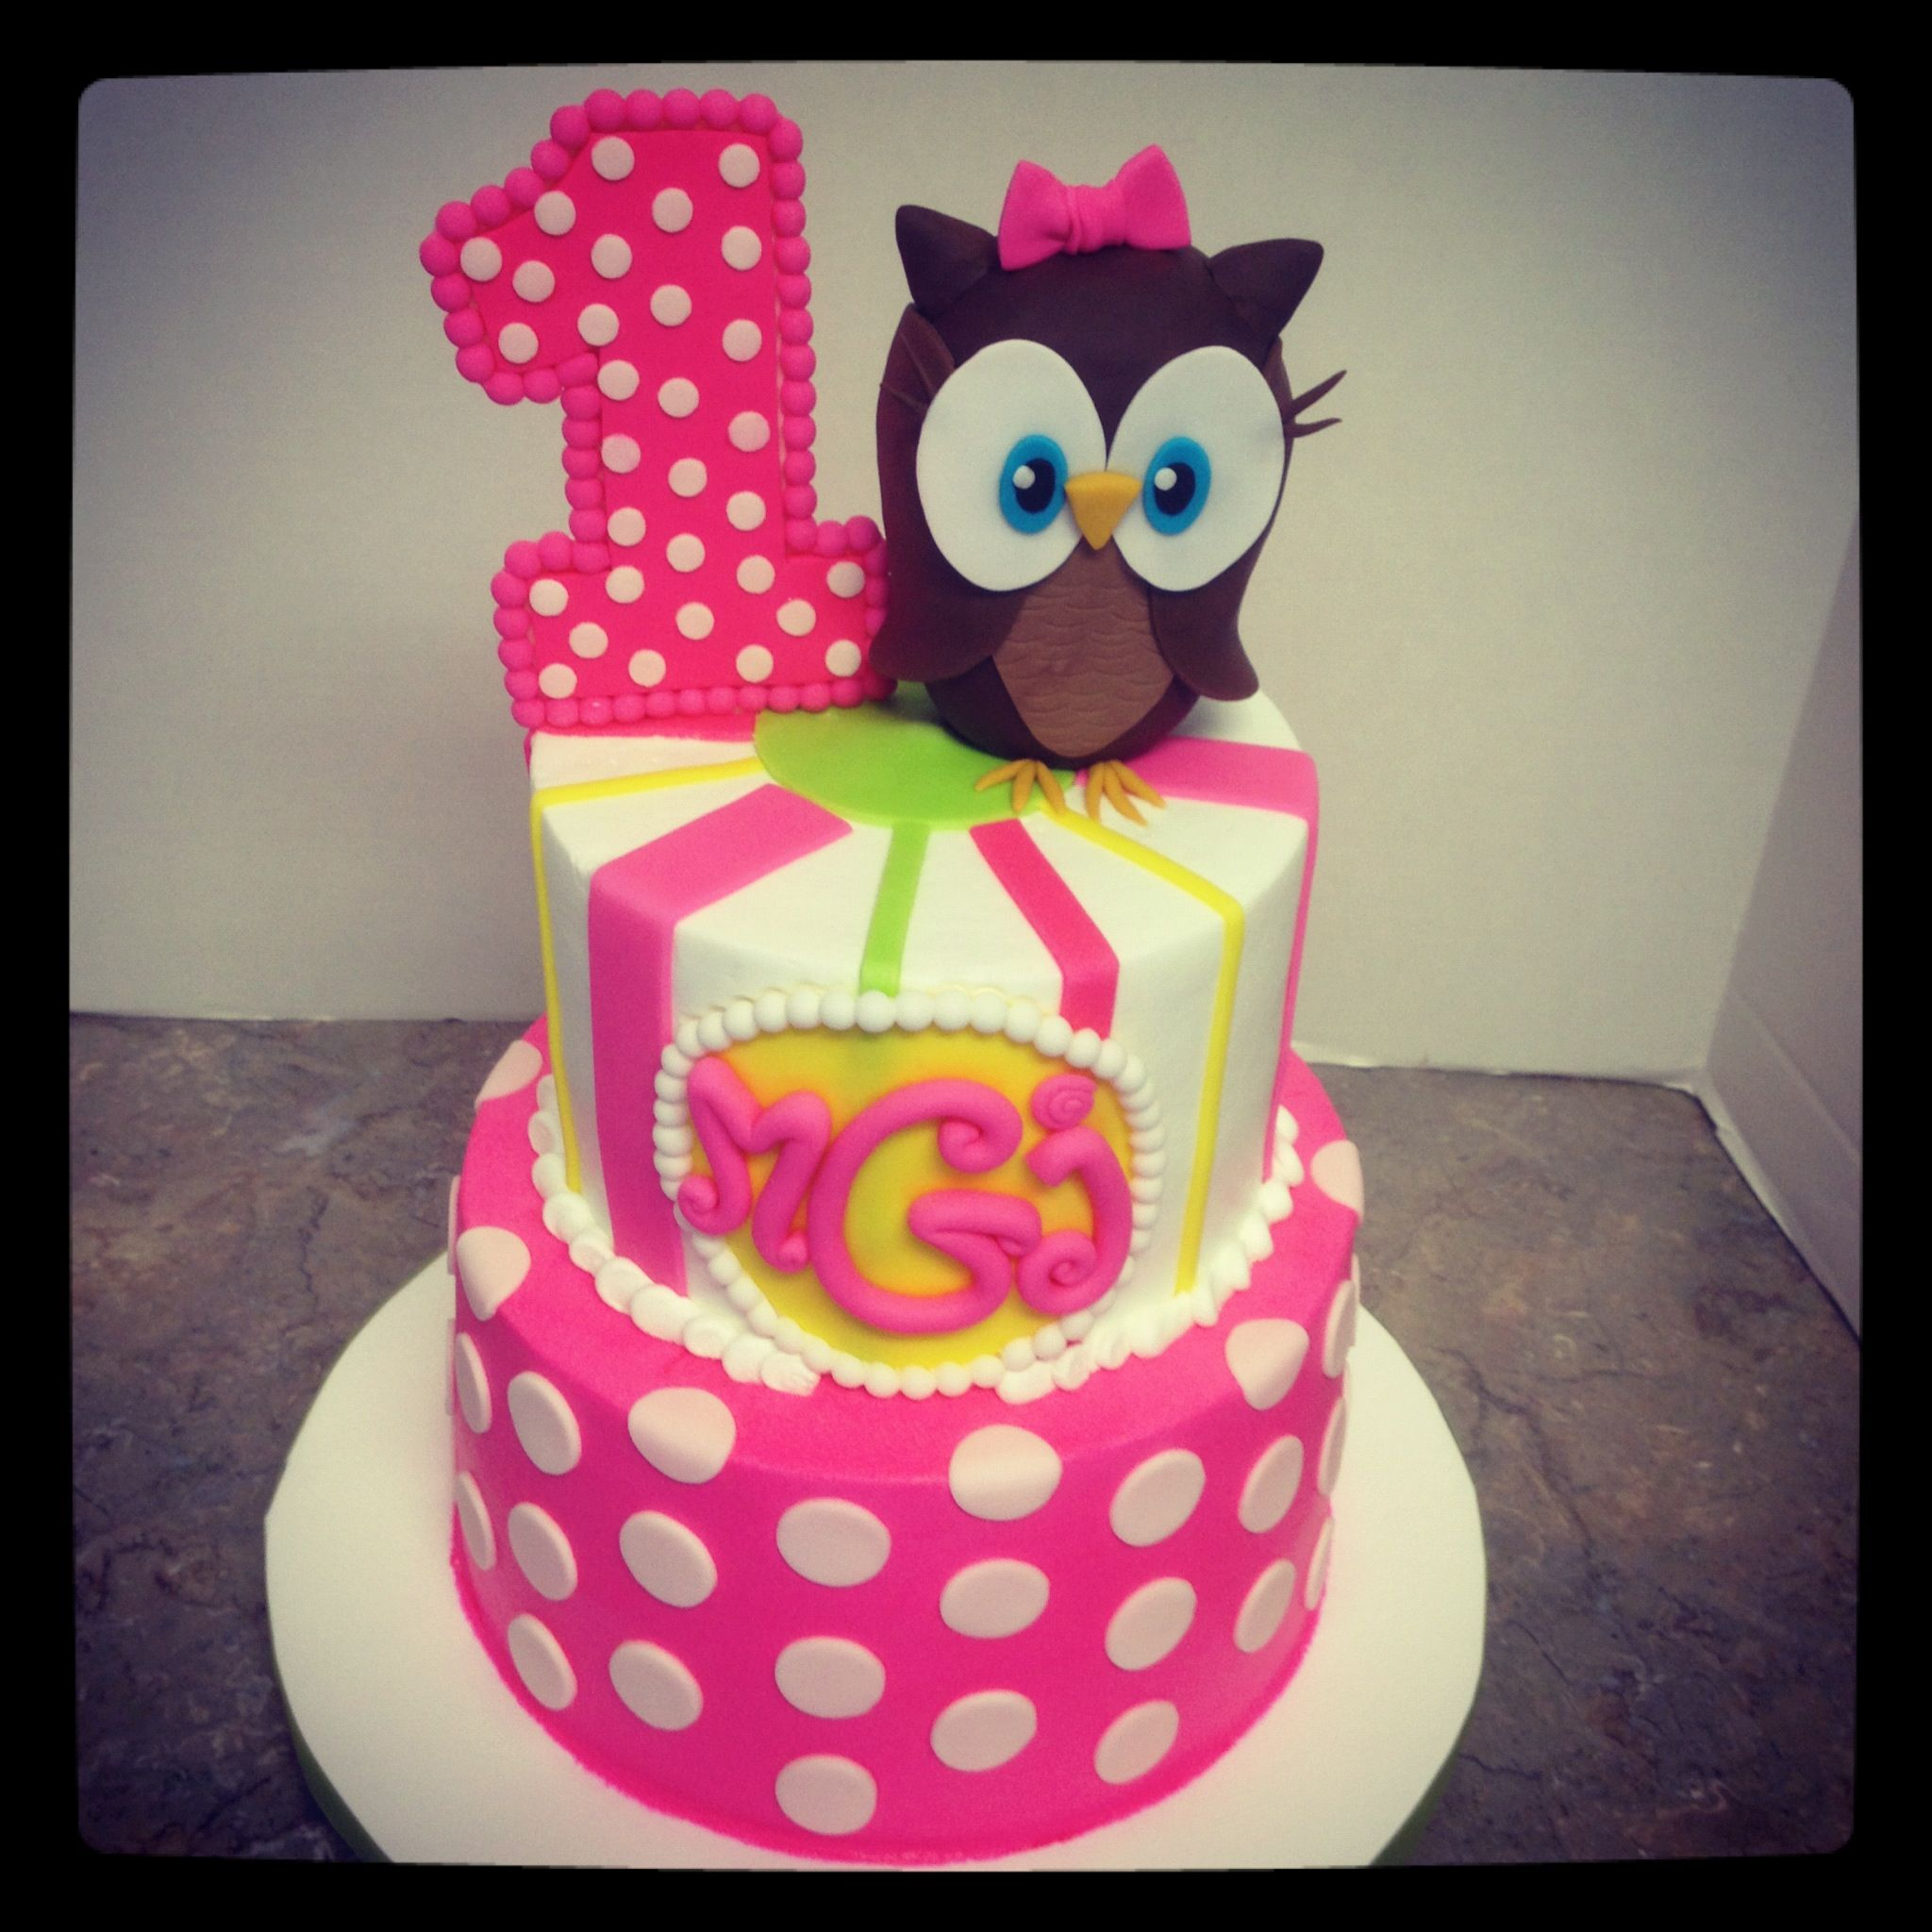 Girly Owl 1st Birthday Cake Designed To Match Party Decor